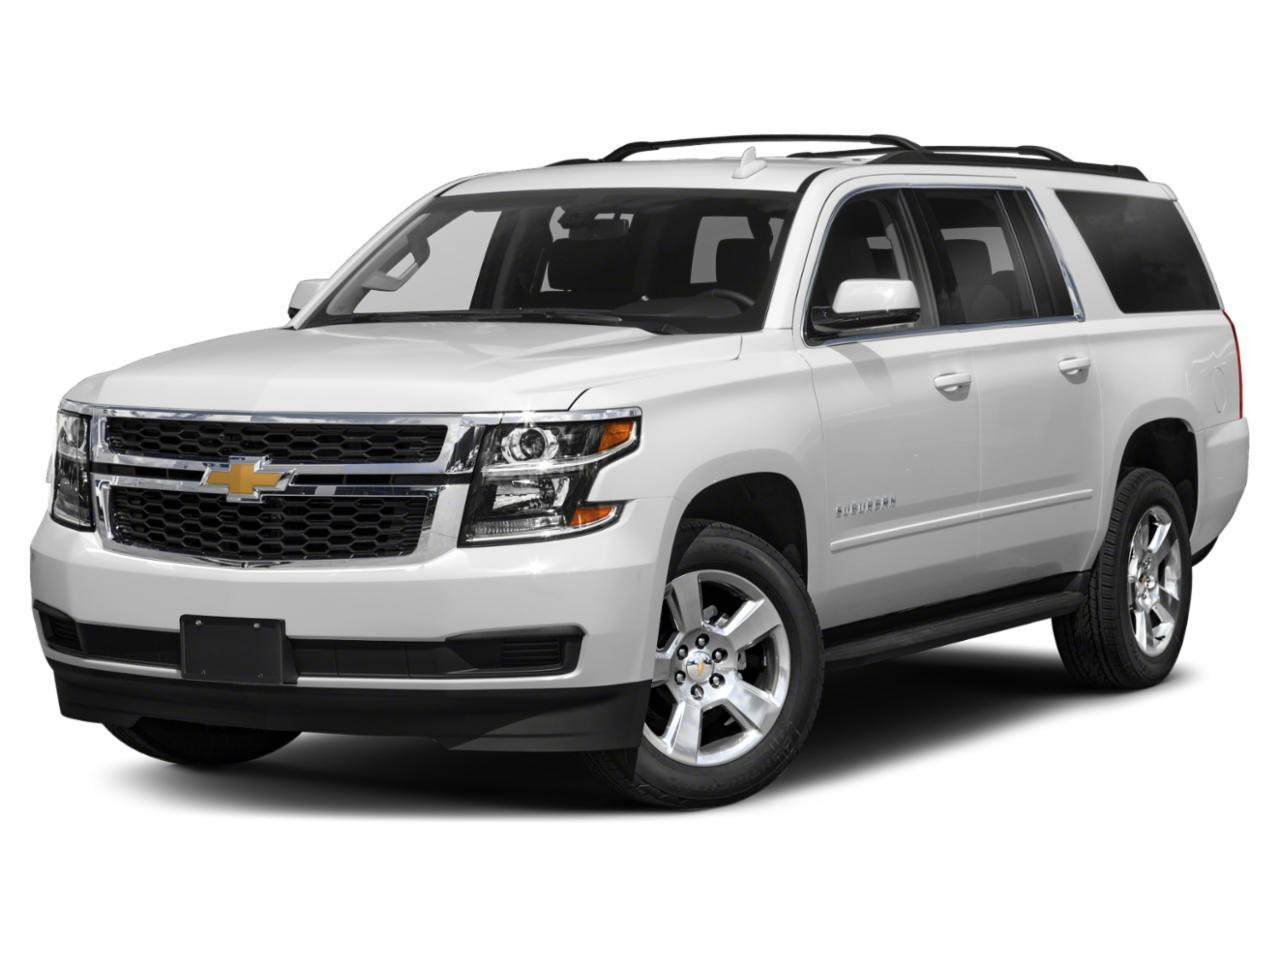 2018 Chevrolet Suburban Vehicle Photo in El Paso, TX 79936